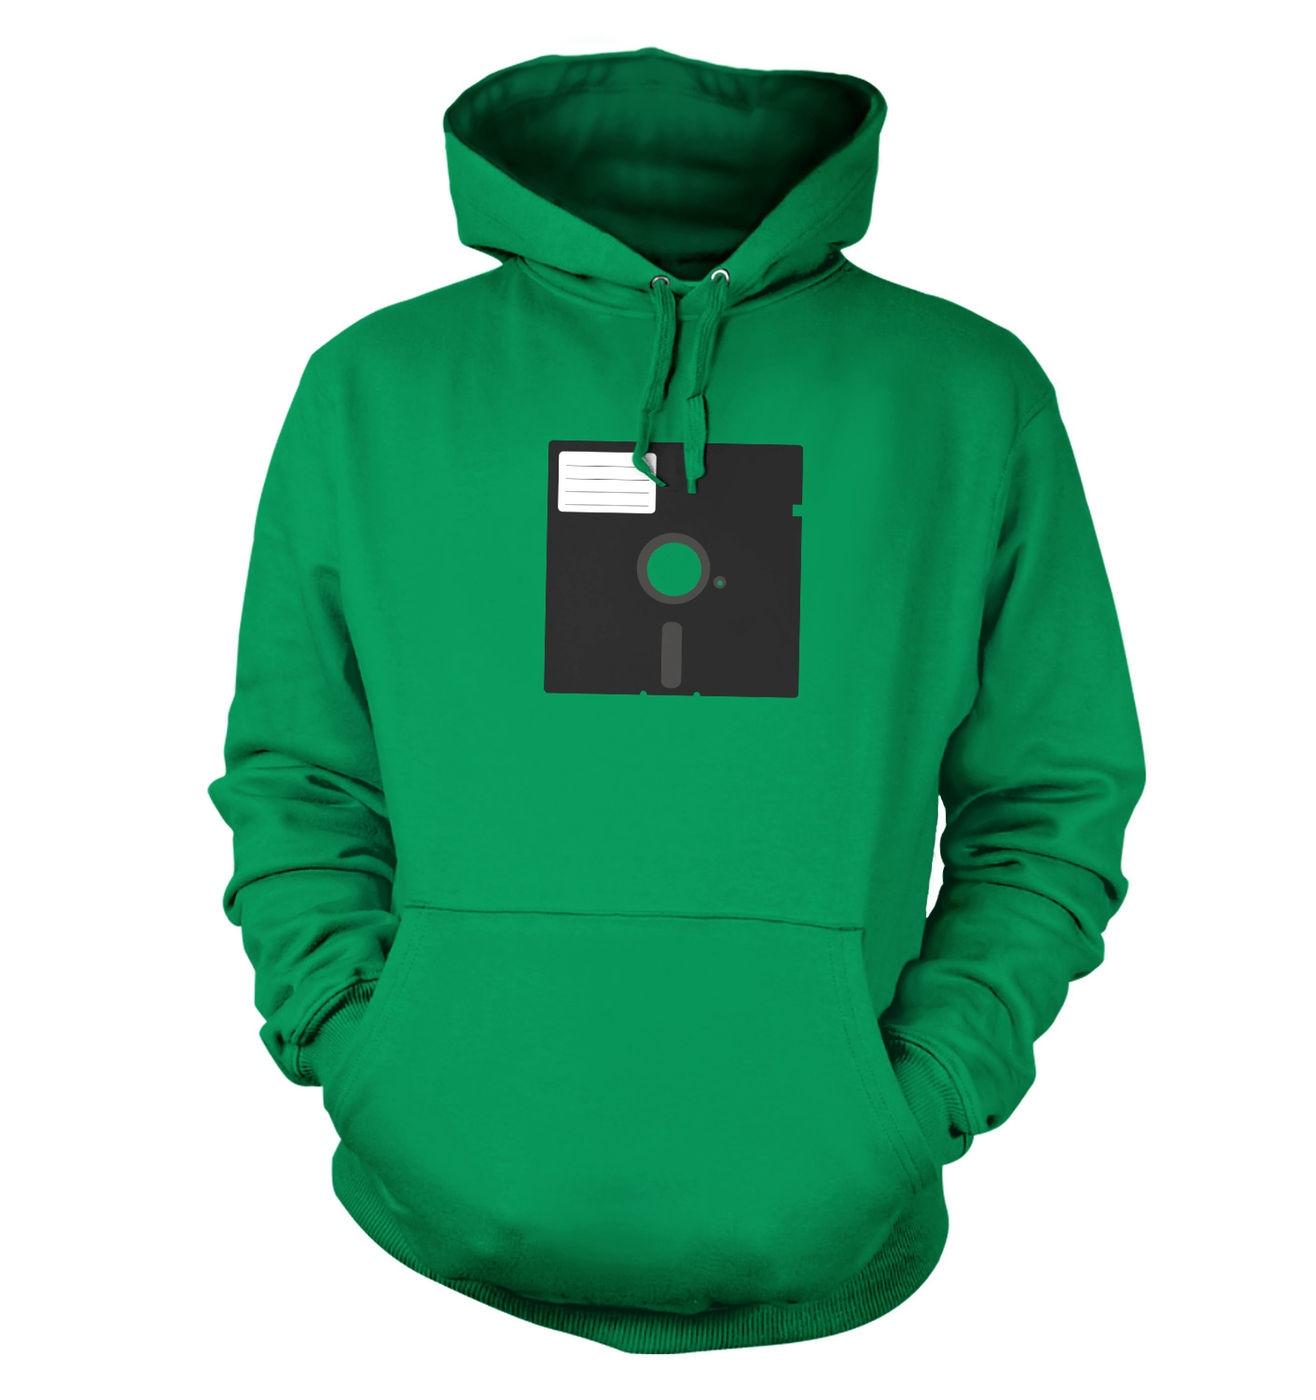 5.25 Inch Floppy Disk hoodie - stylish retro hoodie